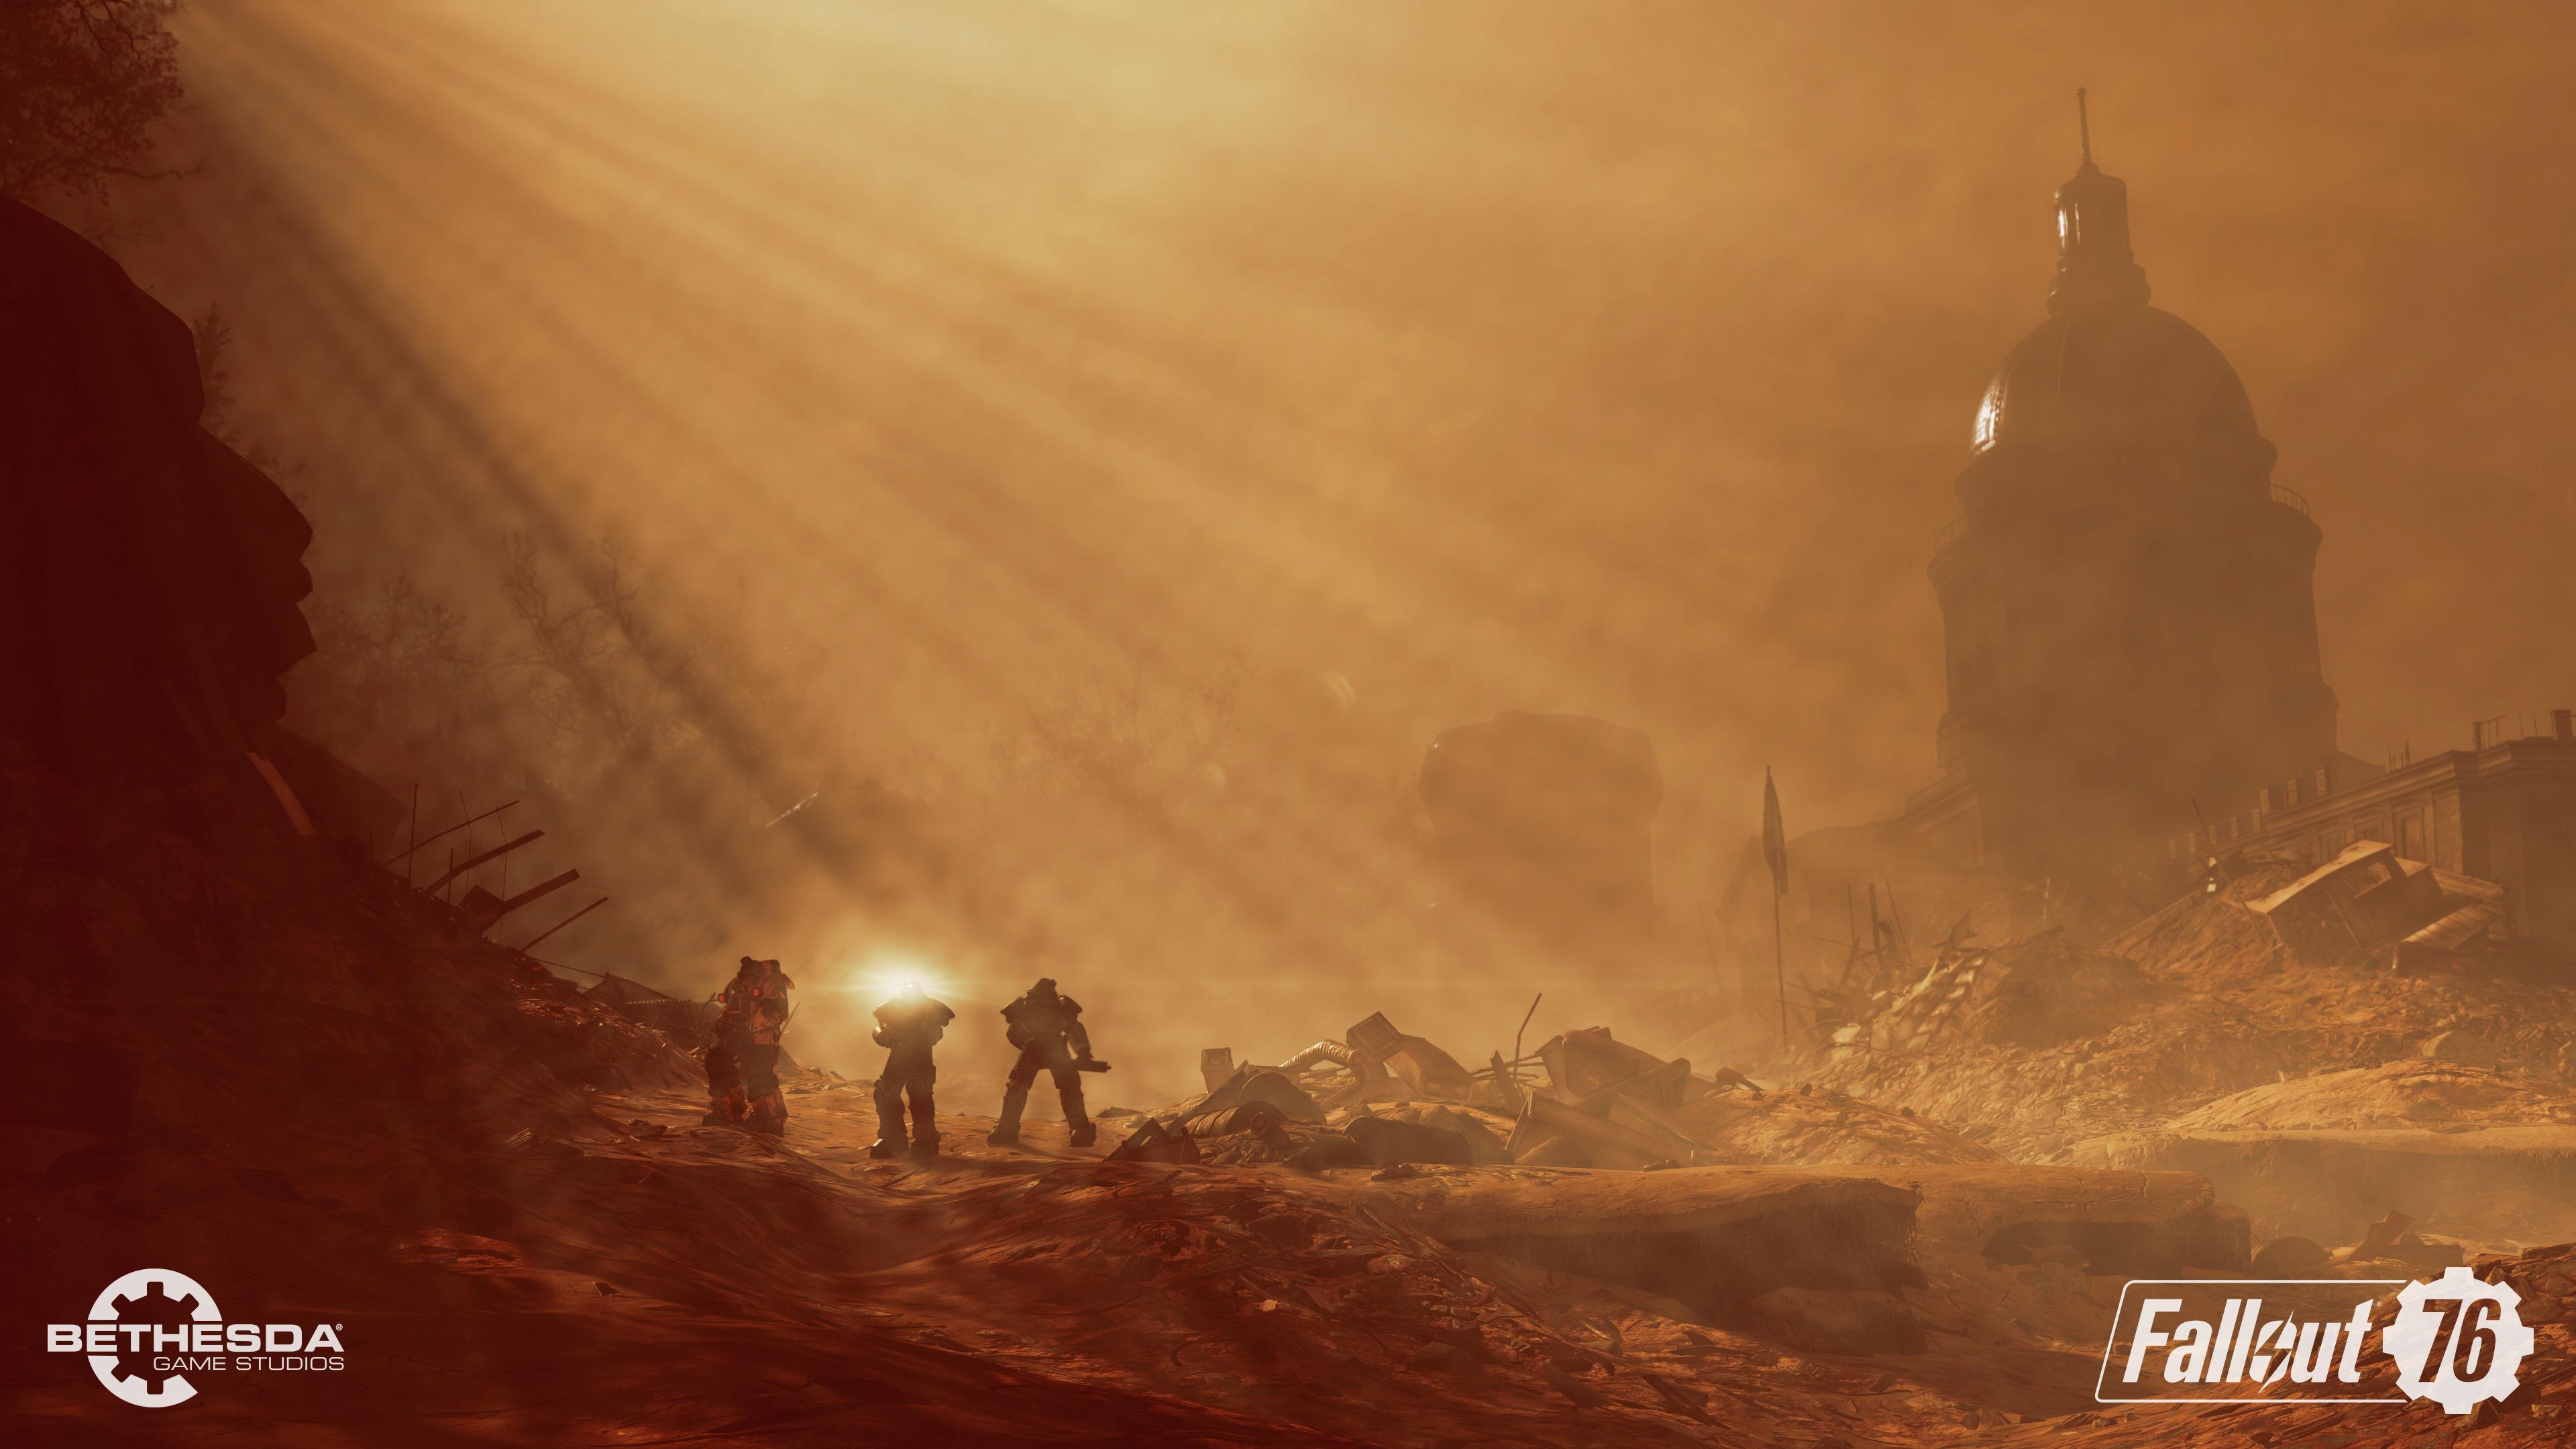 Fallout-76-207802.jpg